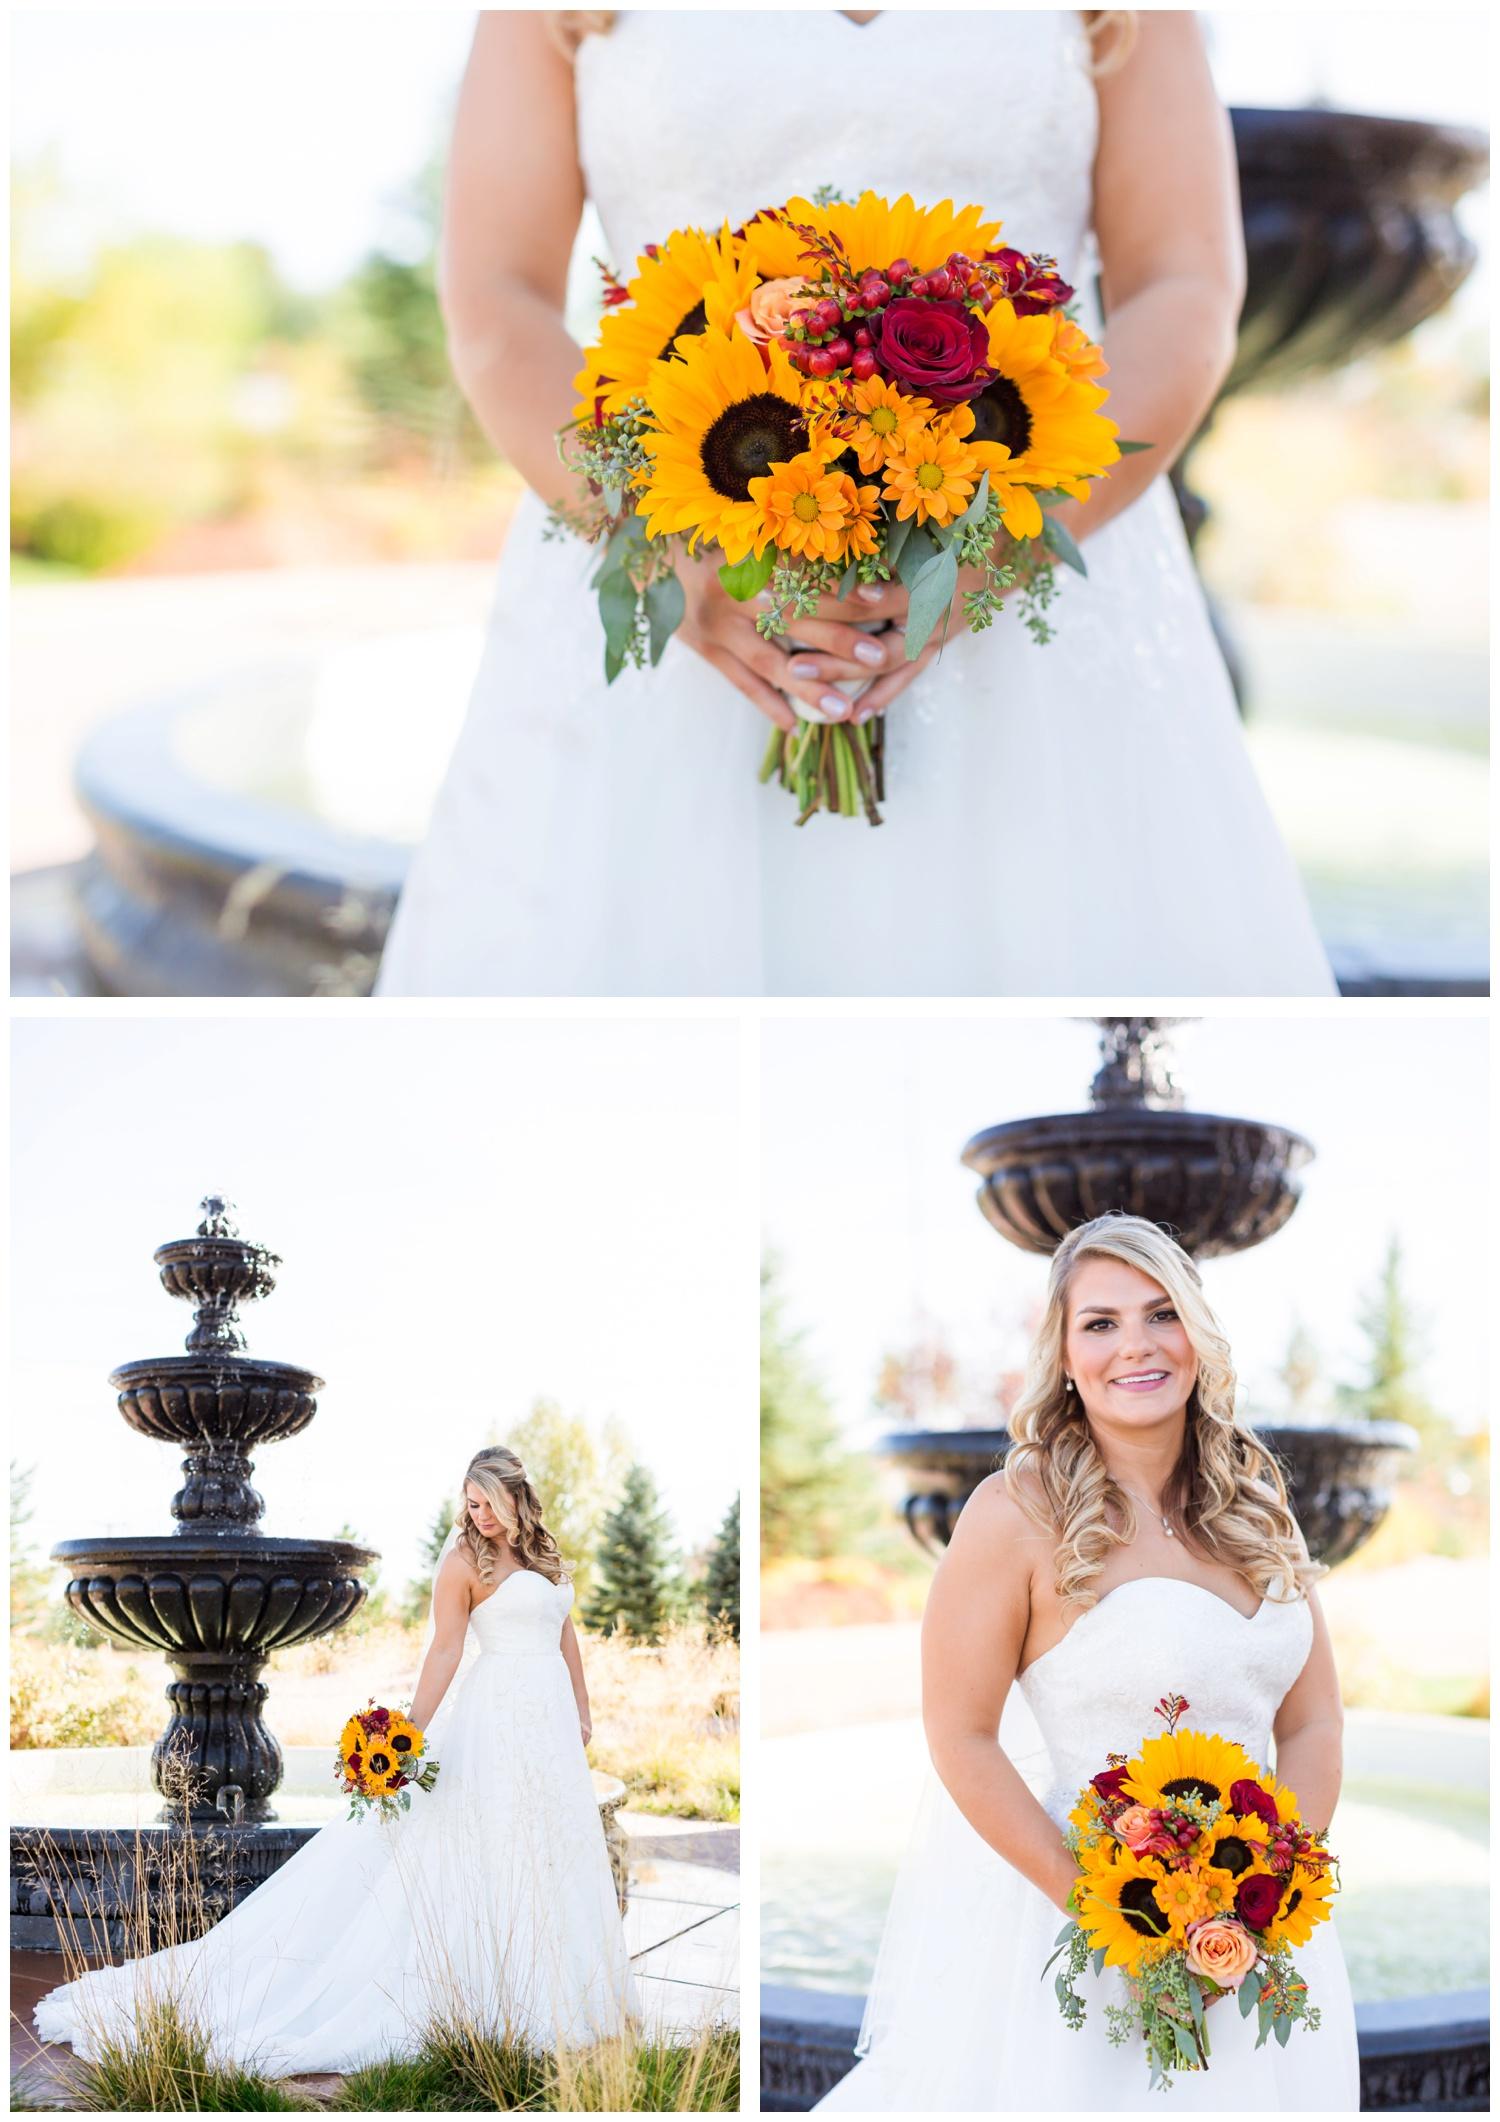 fountains of loveland wedding photography04.jpg